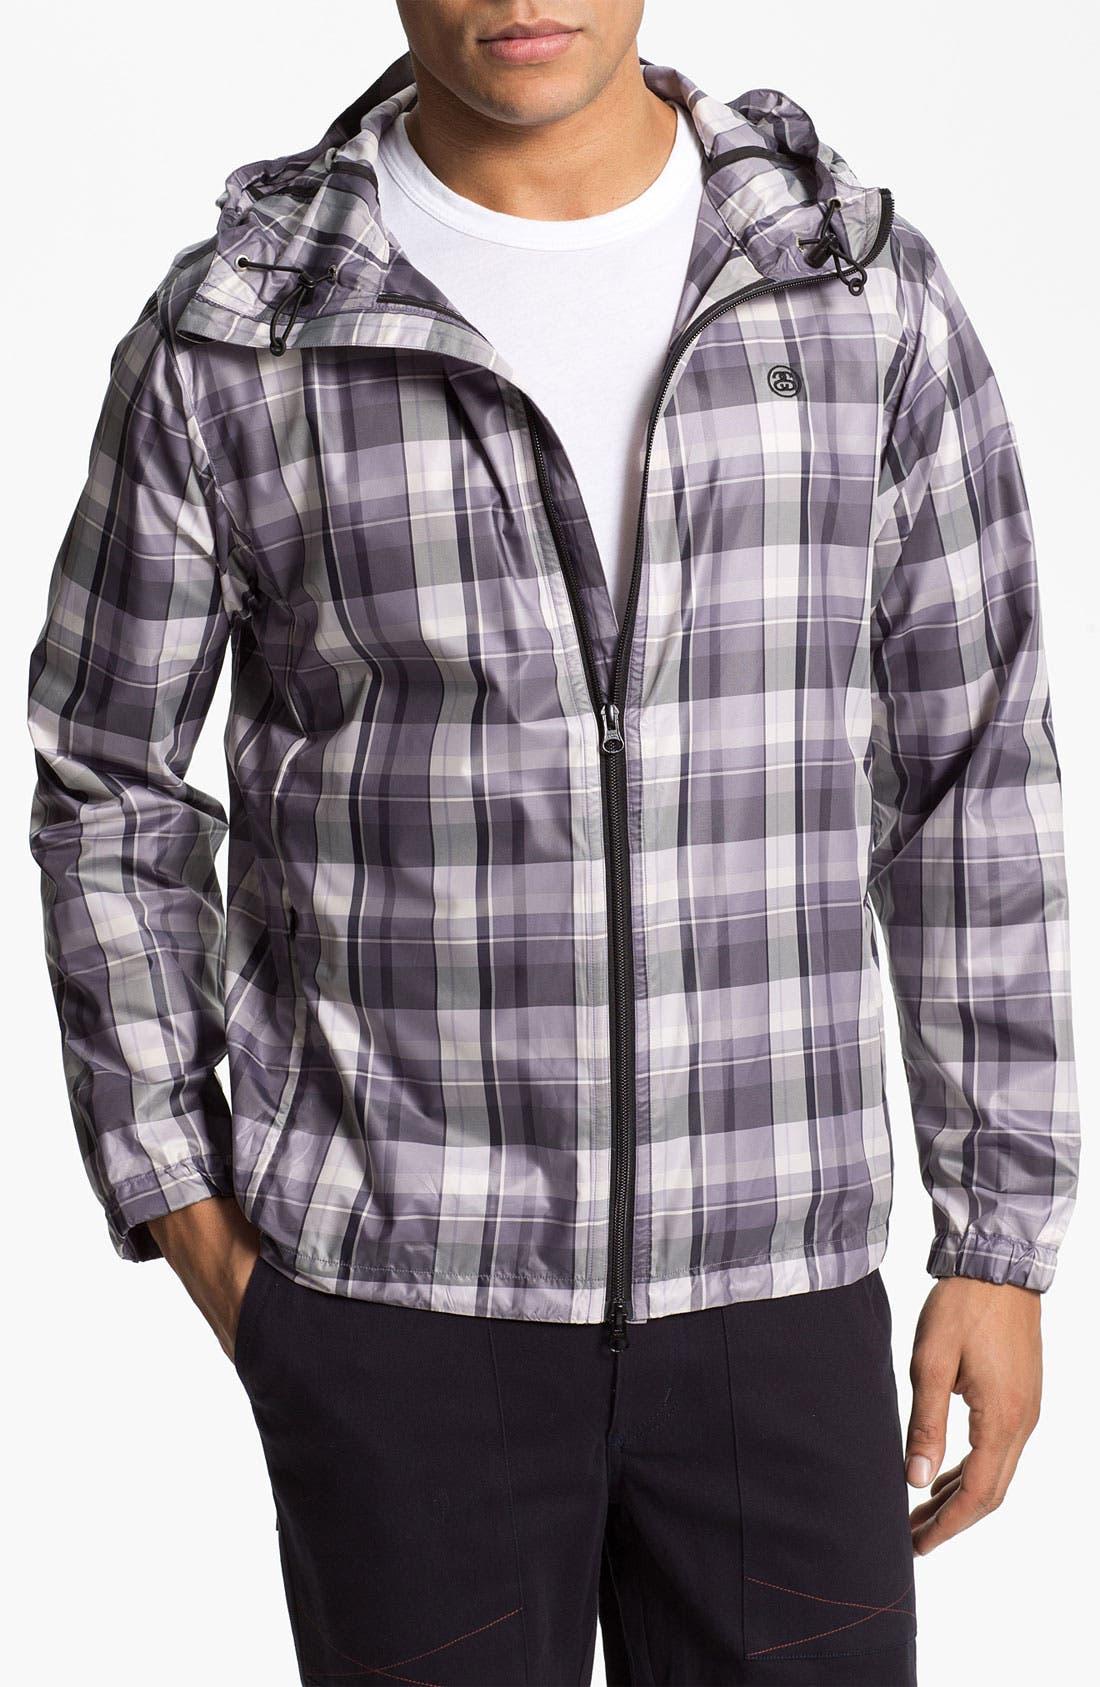 Main Image - Stussy Deluxe Plaid Print Hooded Jacket